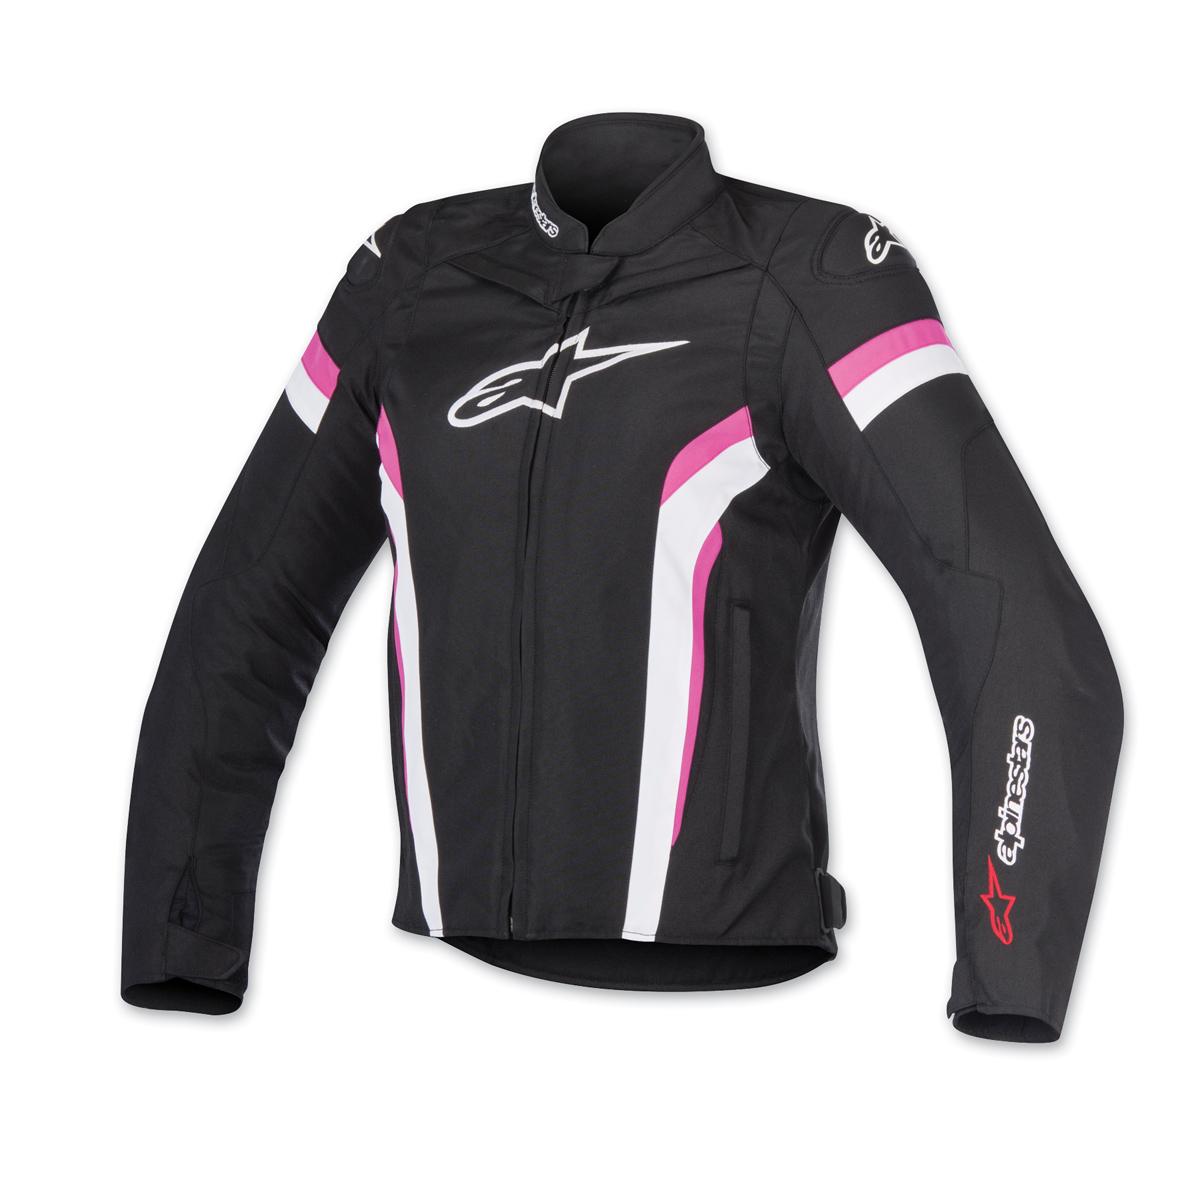 Alpinestars Women's Stella T-GP Plus R v2 Air Black/Fushia Jacket